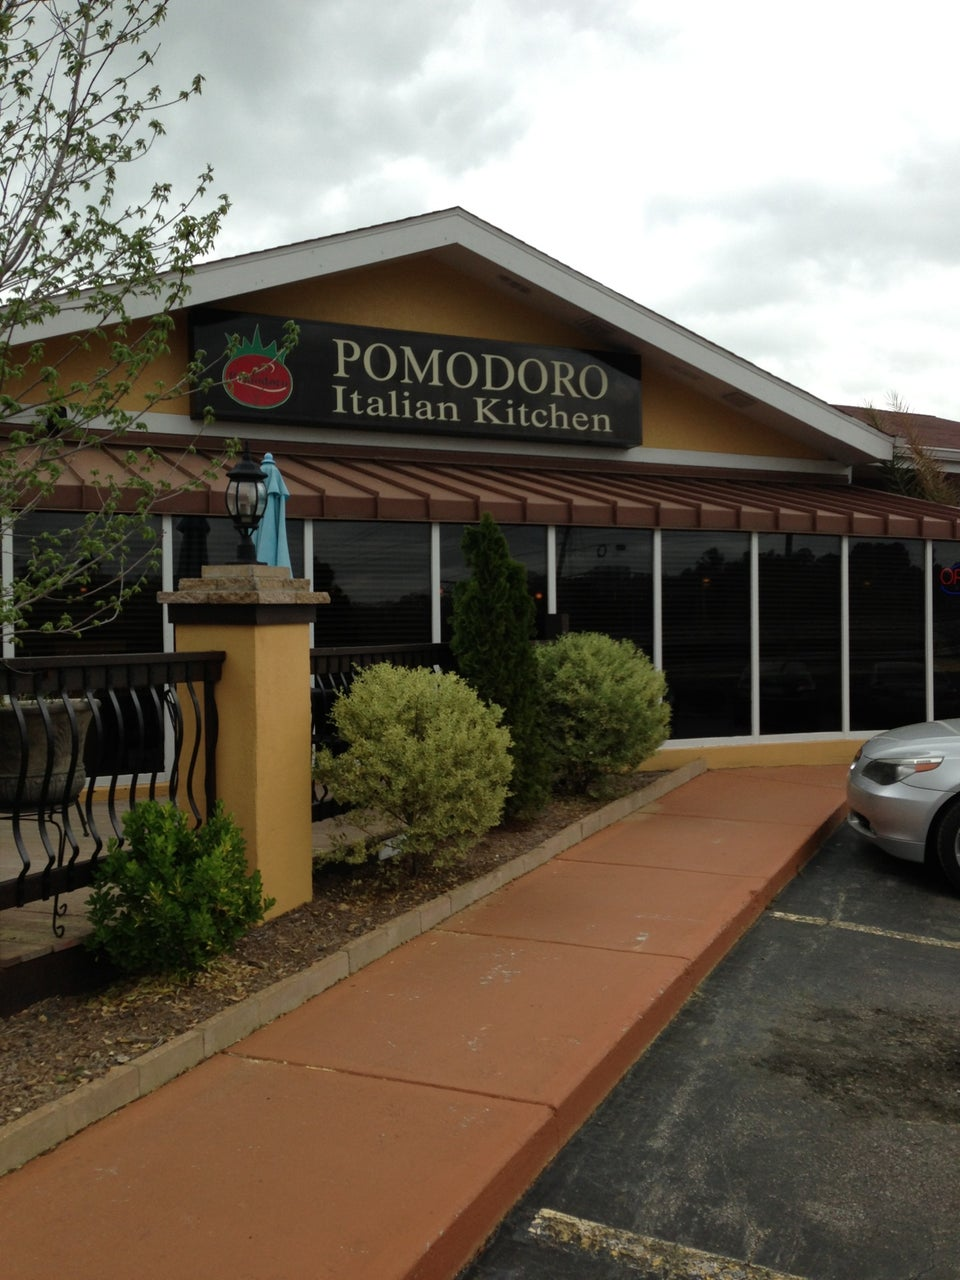 Pomodoro Italian Kitchen 1811 Hillandale Rd, Durham